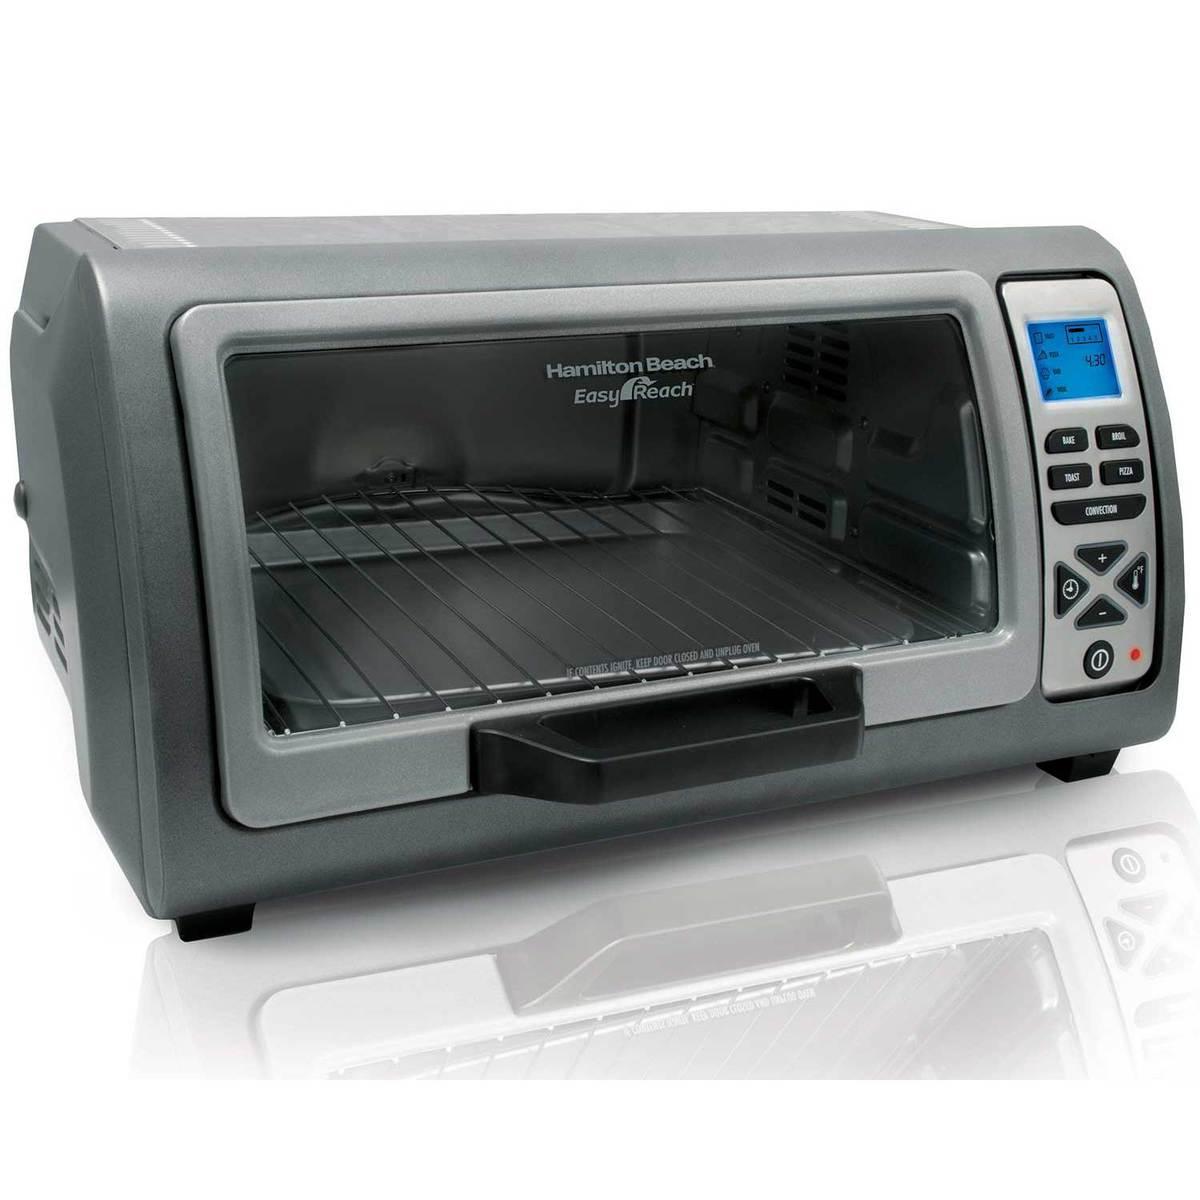 Hamilton Beach 6 Slice Easy Reach Toaster Oven 31128